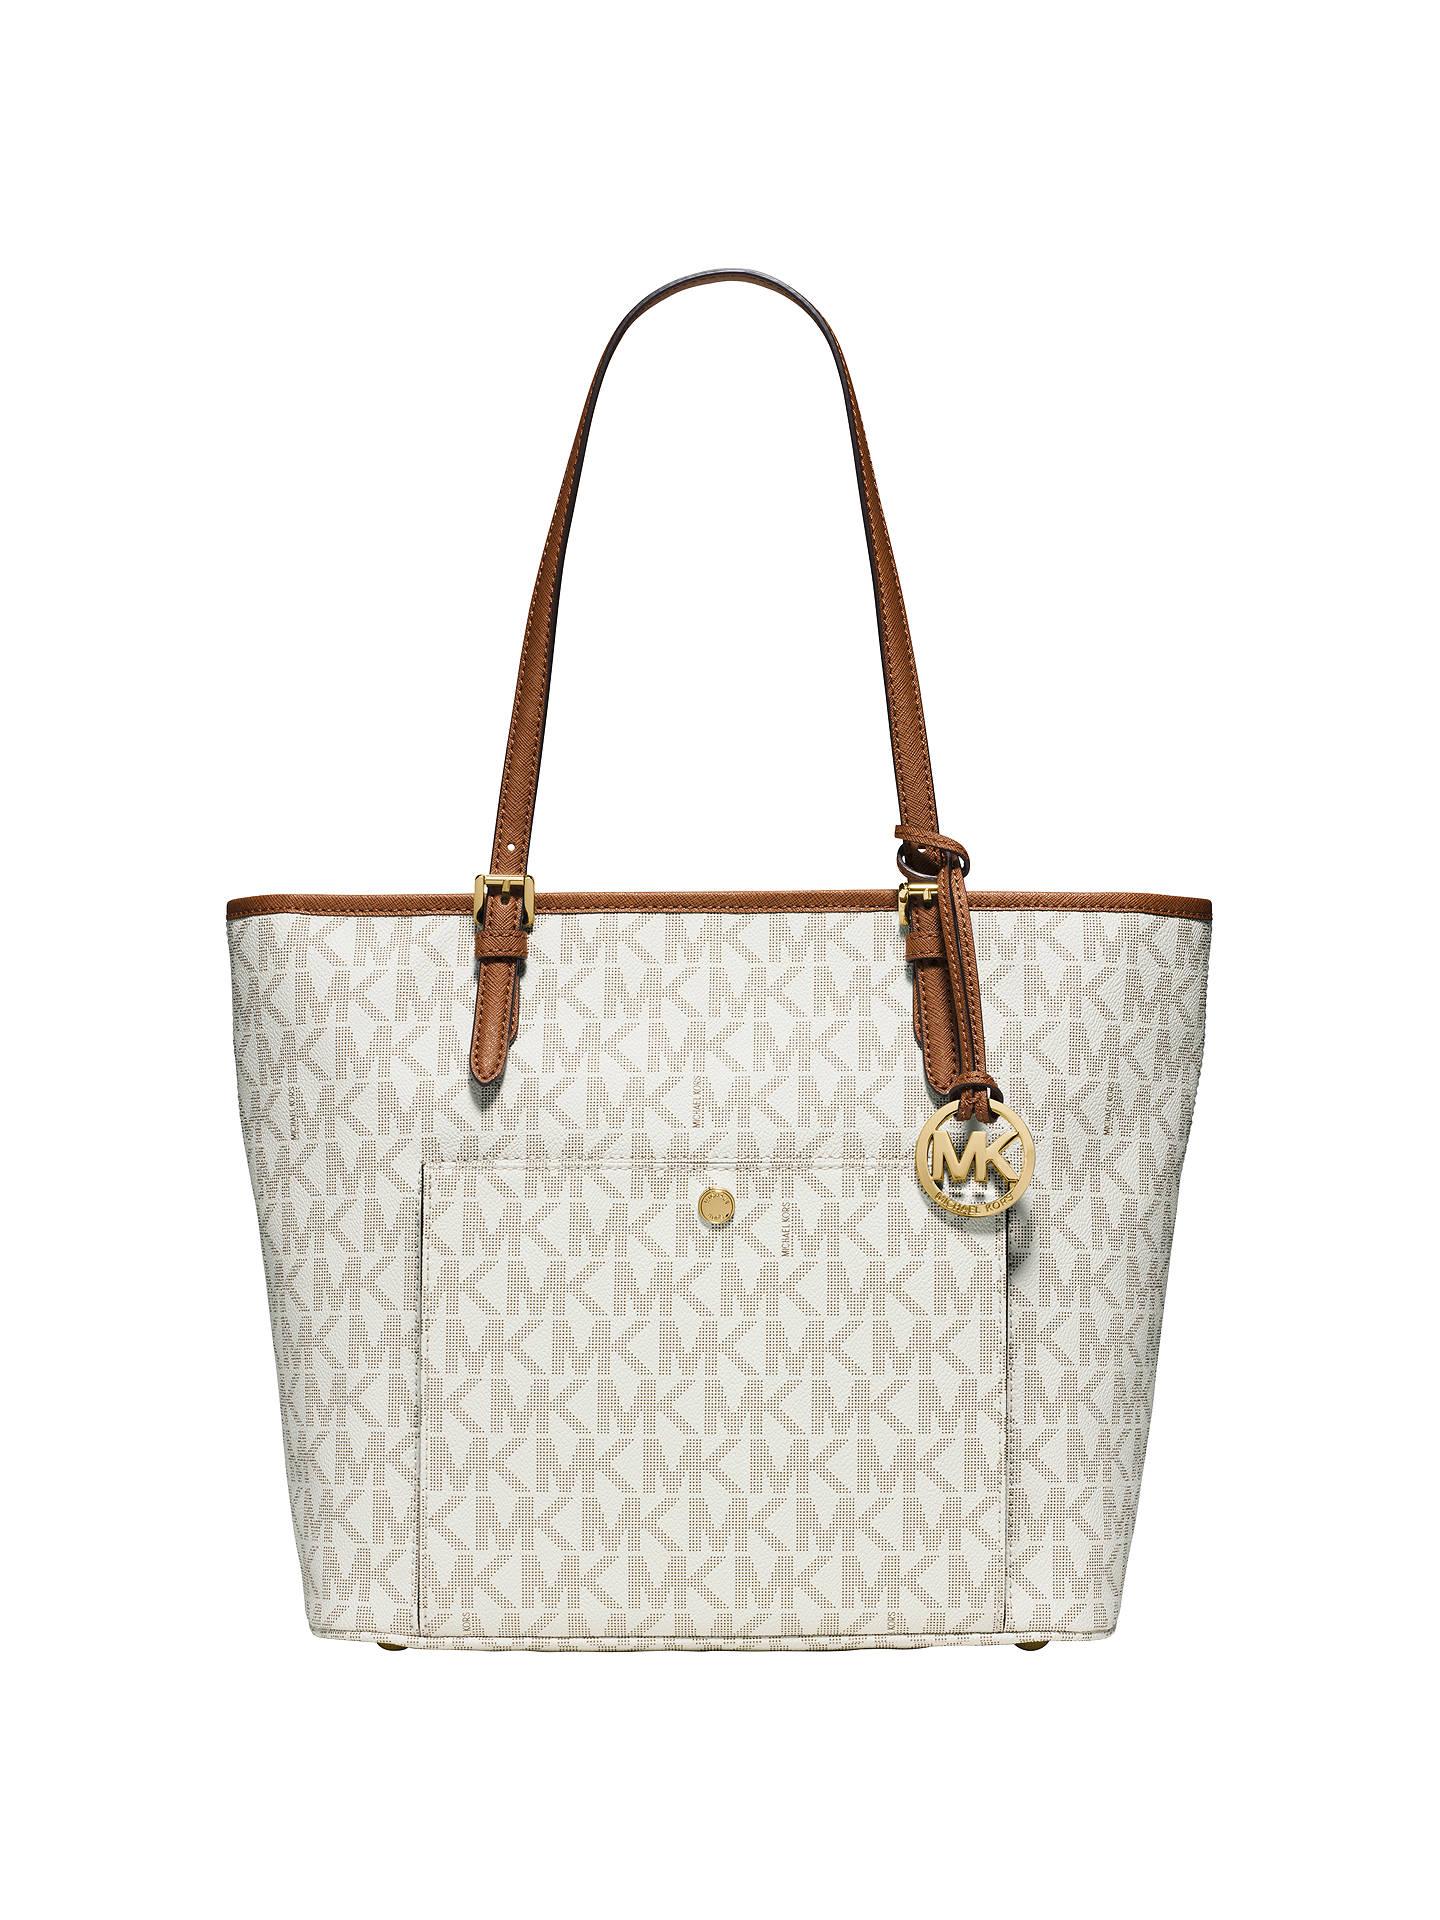 579614f48eb379 Buy MICHAEL Michael Kors Jet Set Medium Snap Pocket Tote Bag, Vanilla  Online at johnlewis ...